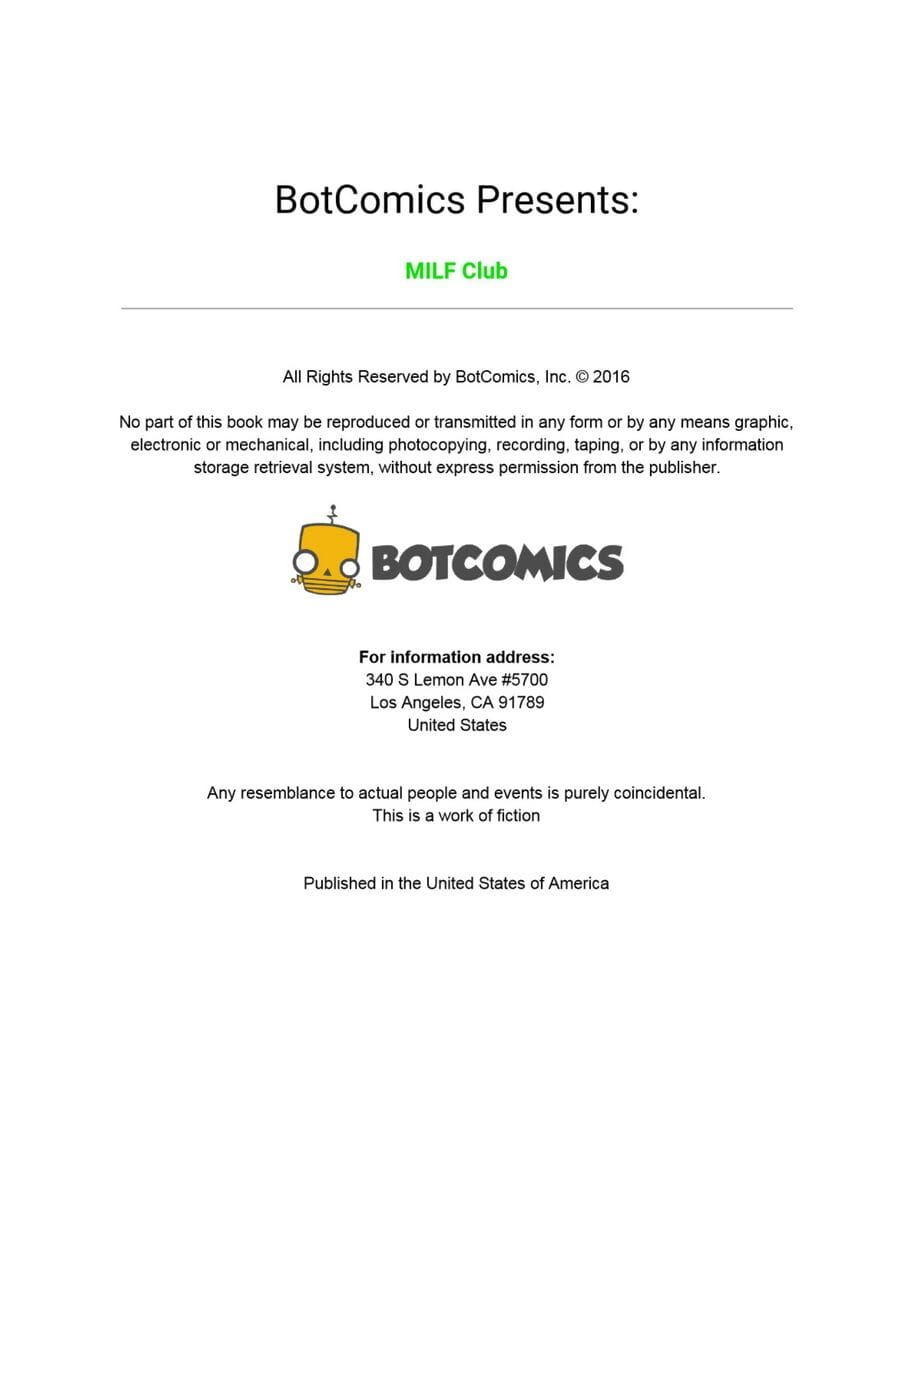 Botcomics- MILF Club 1